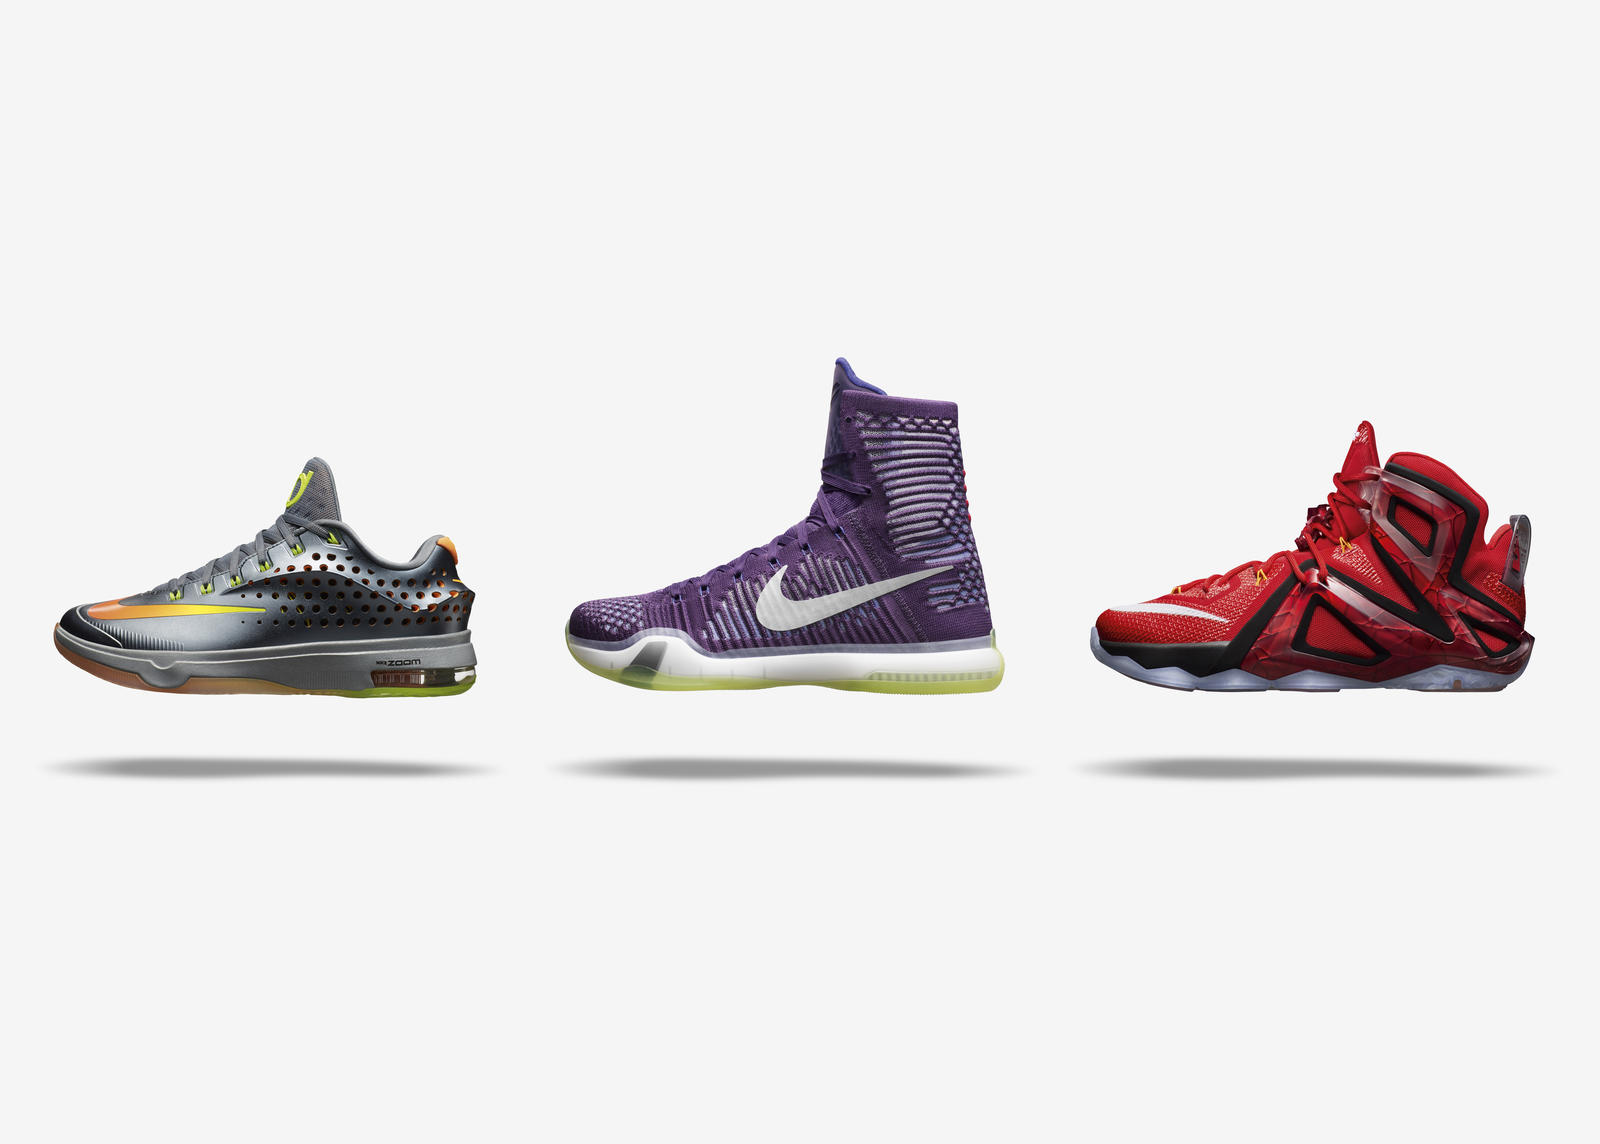 Premium Performance: Nike Basketball Elite Series Elevates